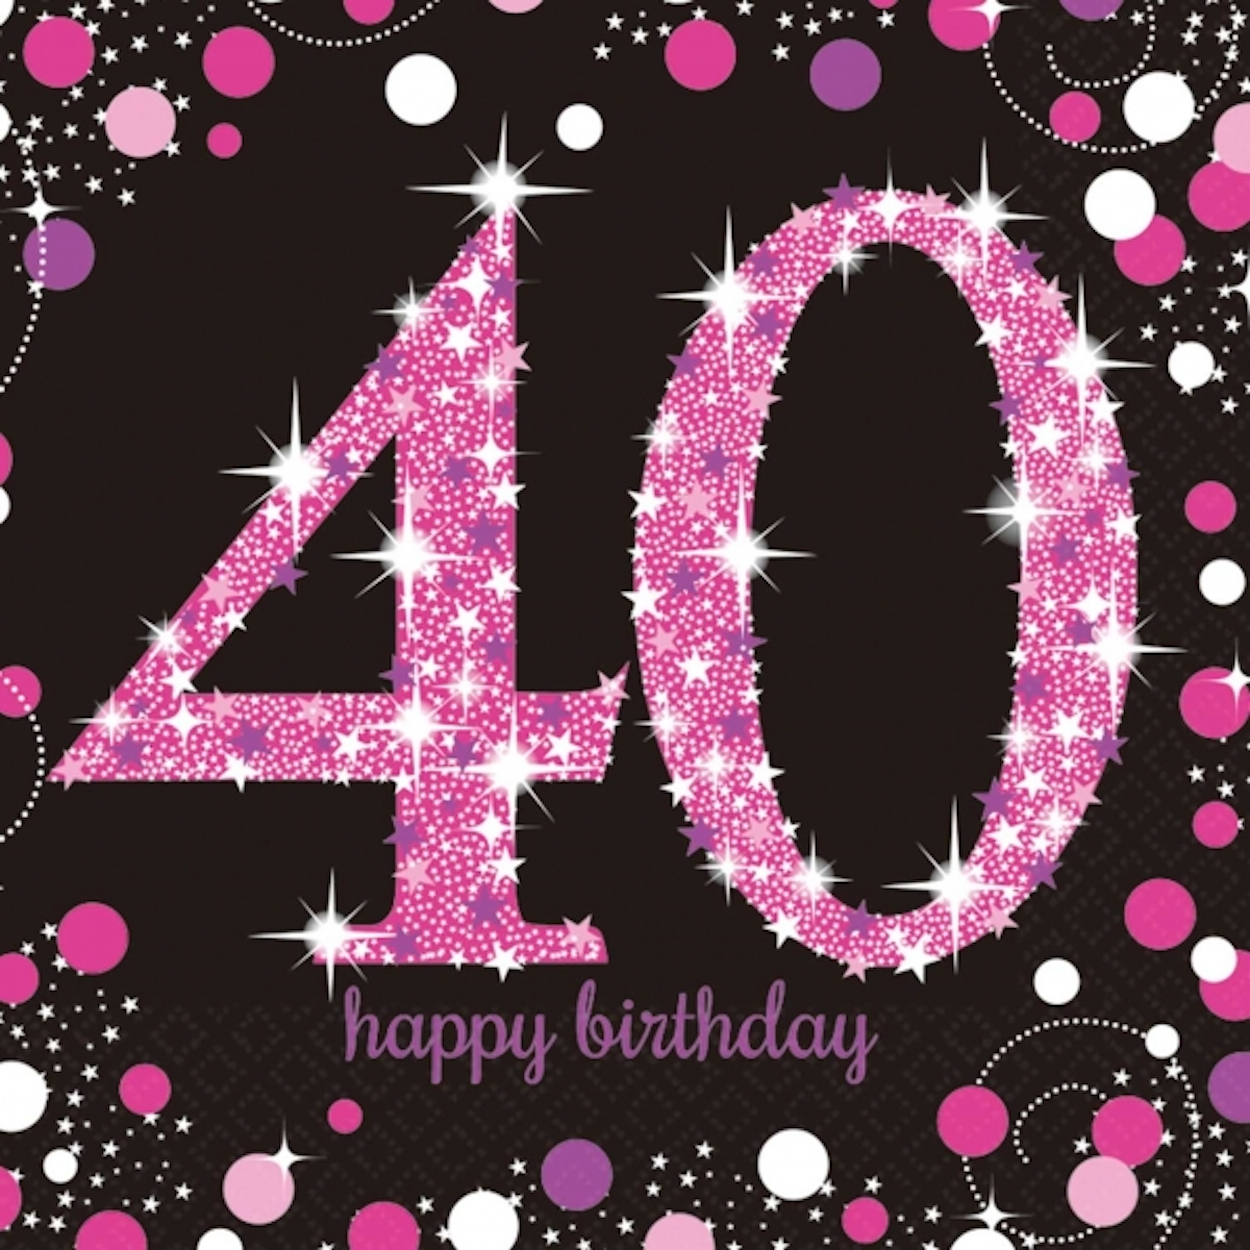 16 x pink celebration age 40 napkins pink black 40th birthday napkins free p p ebay. Black Bedroom Furniture Sets. Home Design Ideas